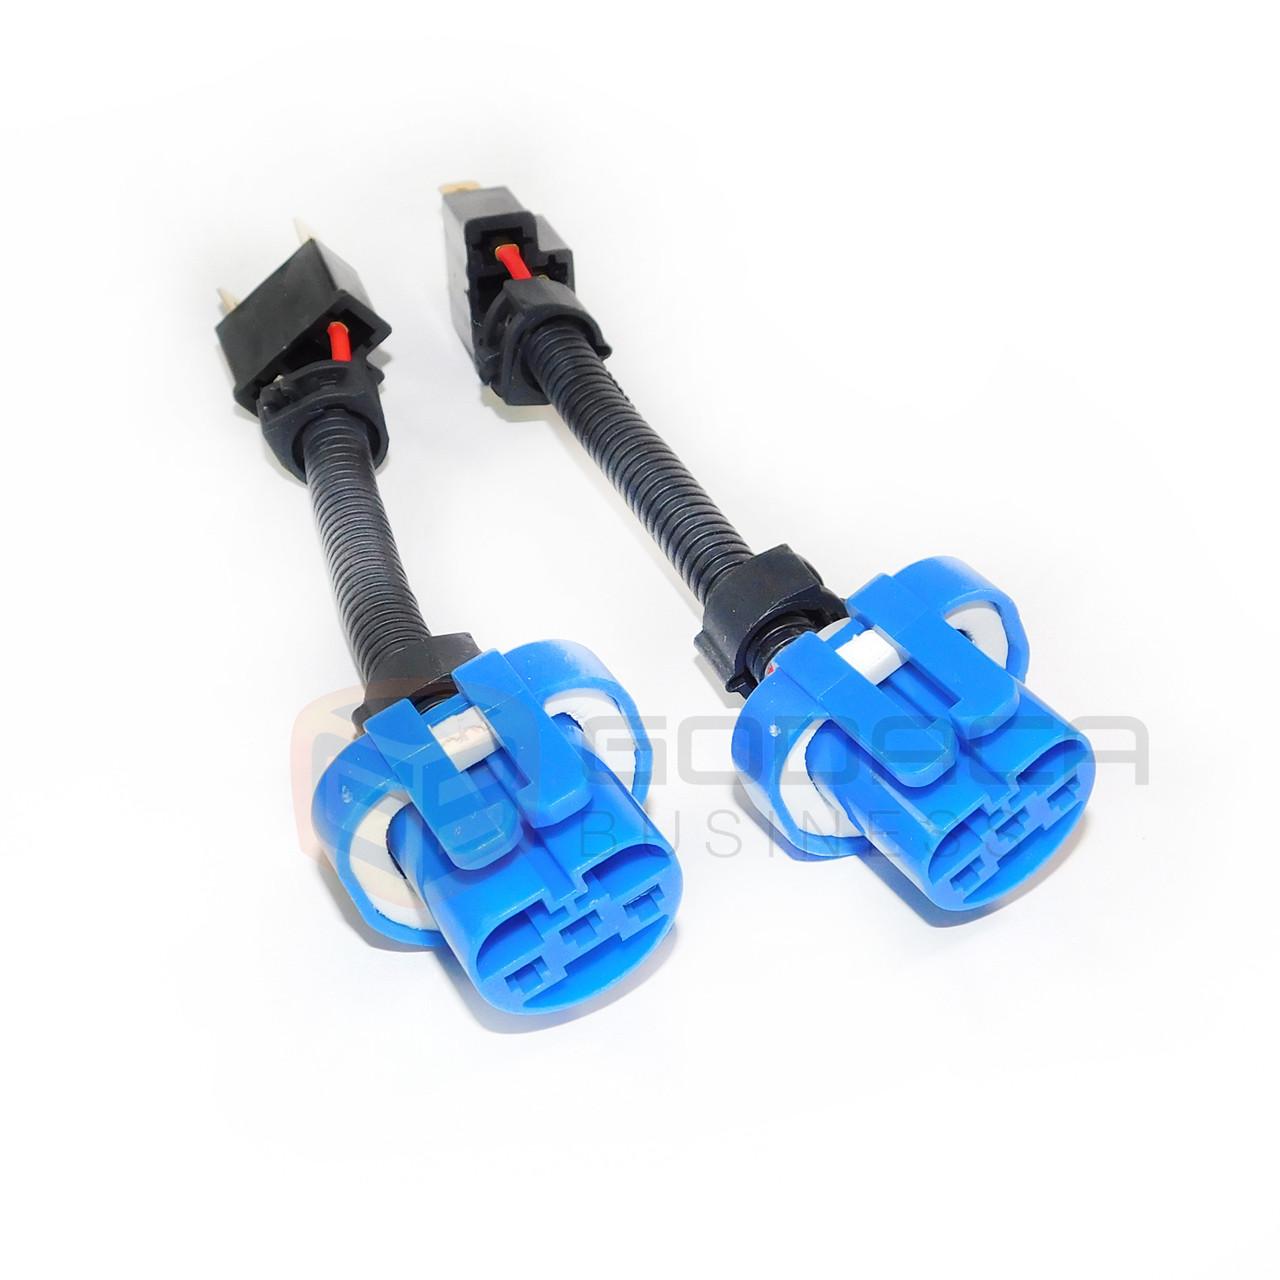 small resolution of 2x h4 9003 to 9007 hb5 headlight wiring conversion adapter plug play godaca llc